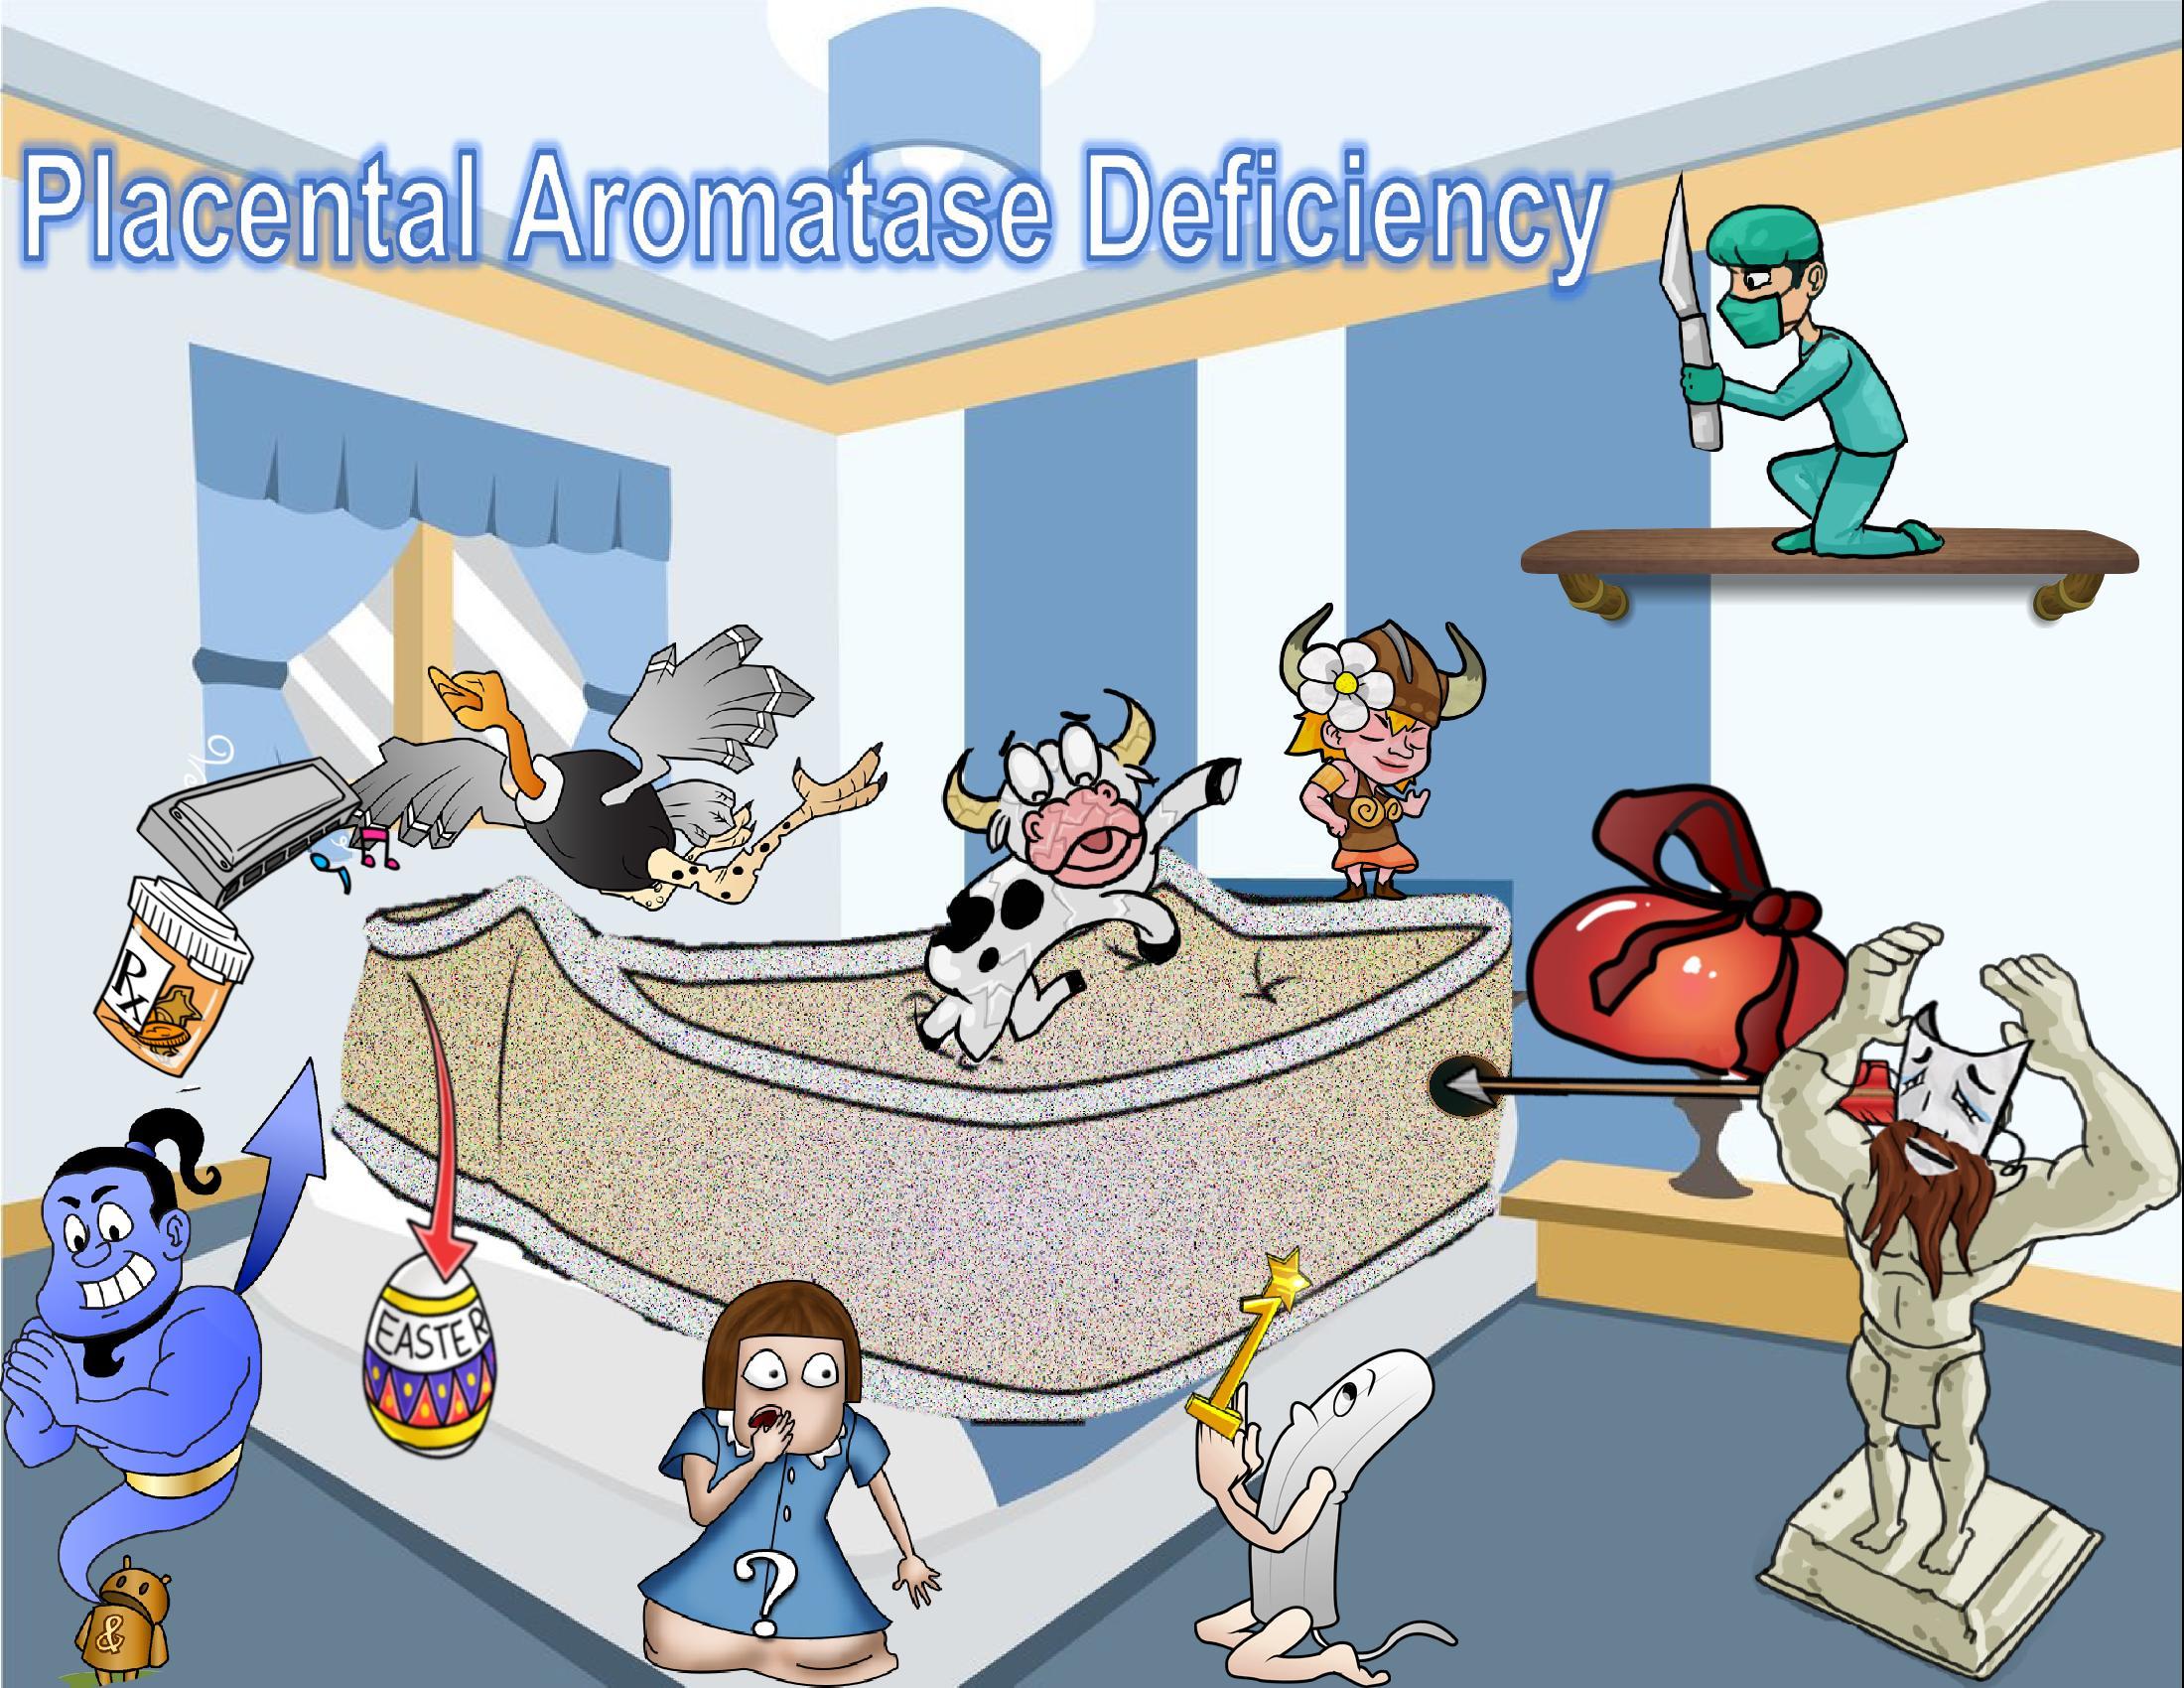 Placental Aromatase Deficiency